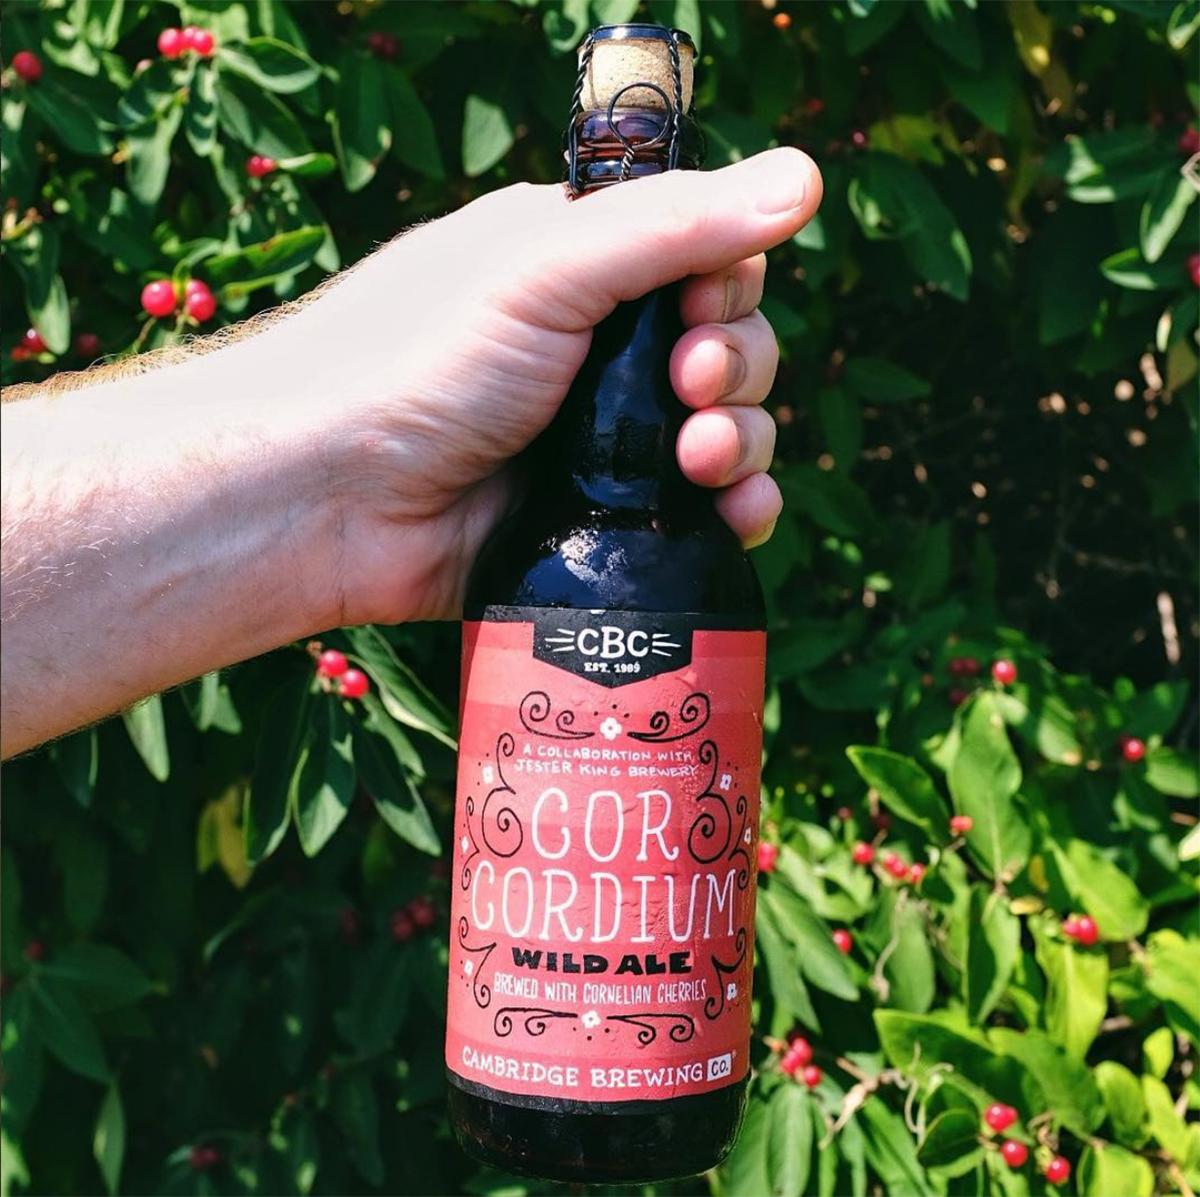 Cambridge Brewing Company / Jester King Cor Cordium wild ale won a bronze medal at GABF in 2017